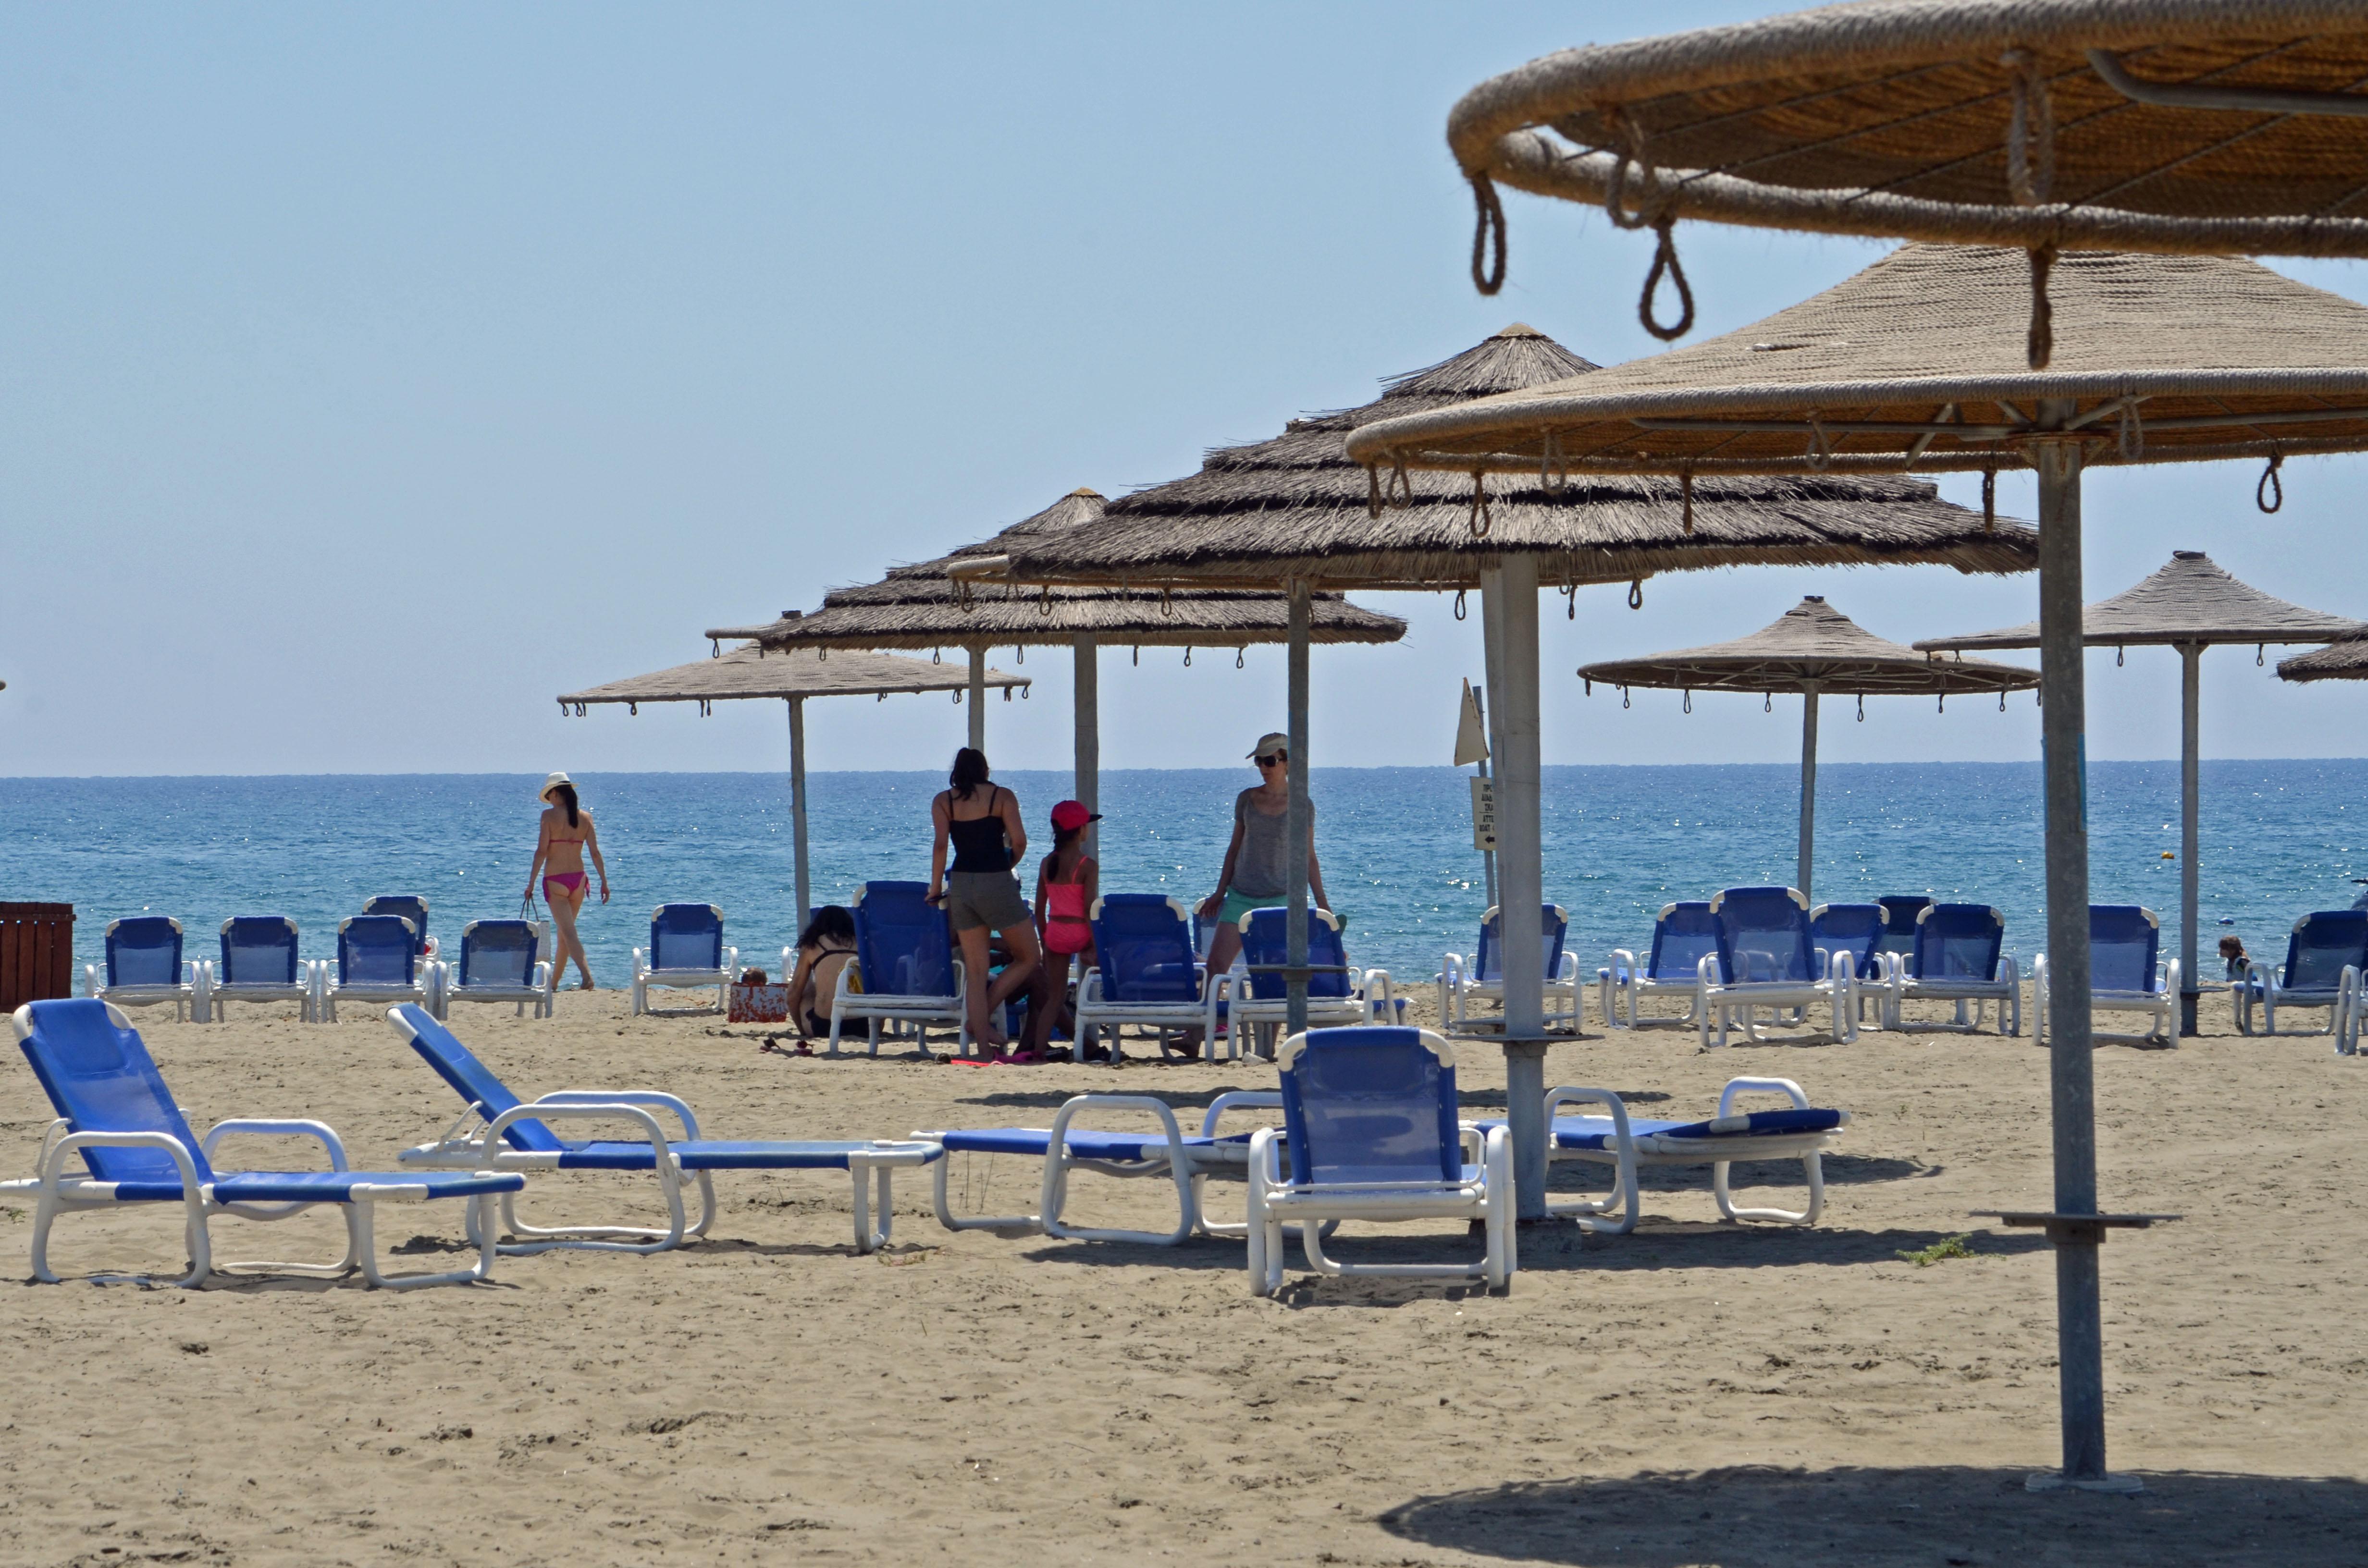 Limasol Kipar letovanje mesta hoteli aranžmani Limasol